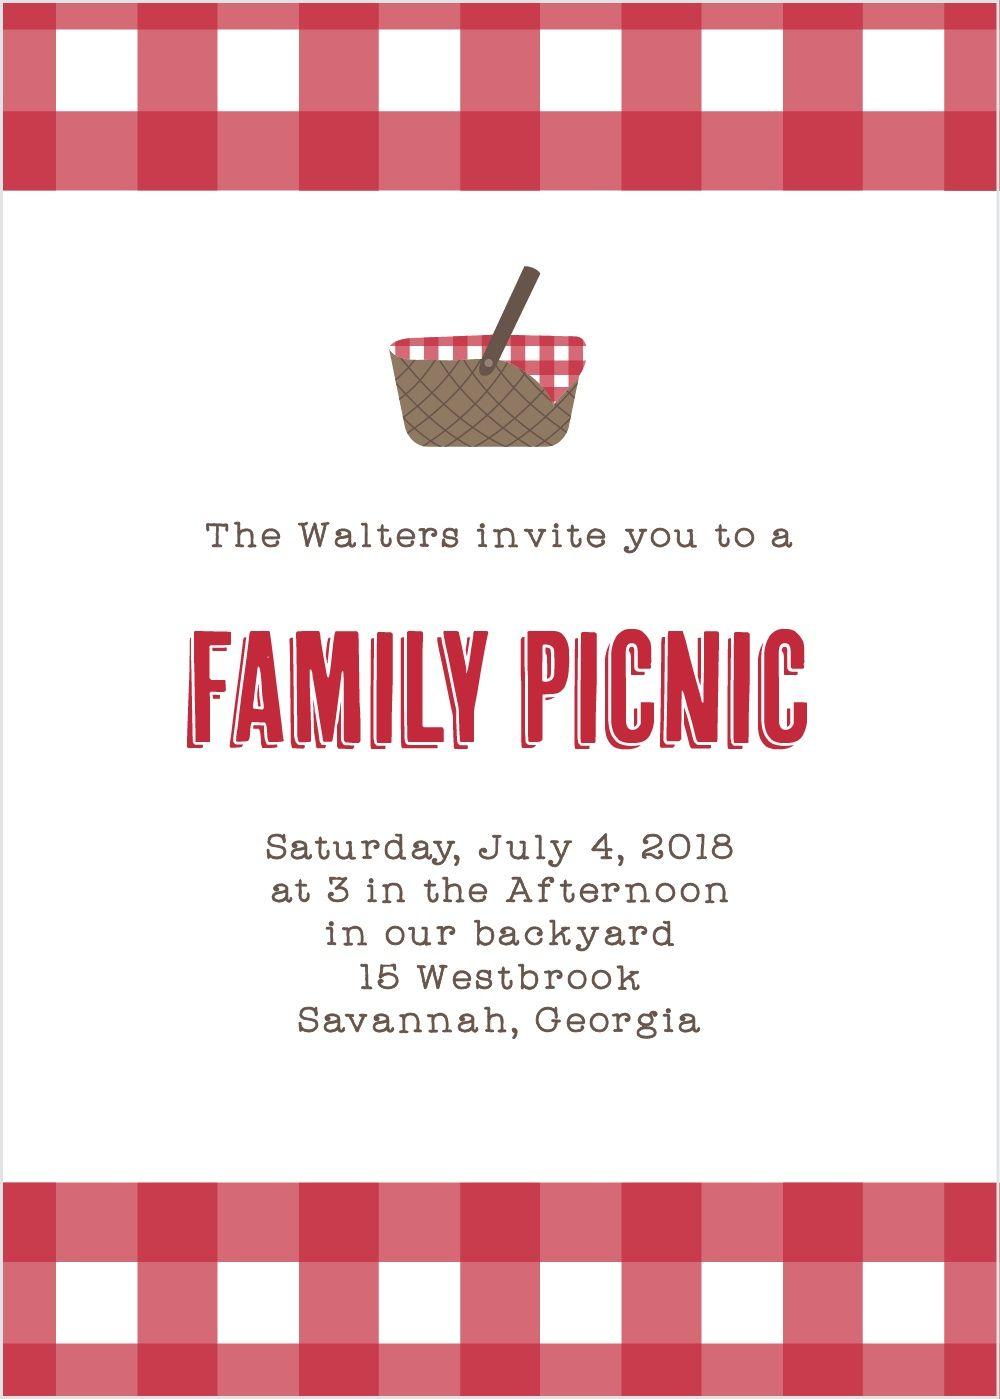 Family Picnic Party Invitations | Family picnic | Pinterest | Family ...